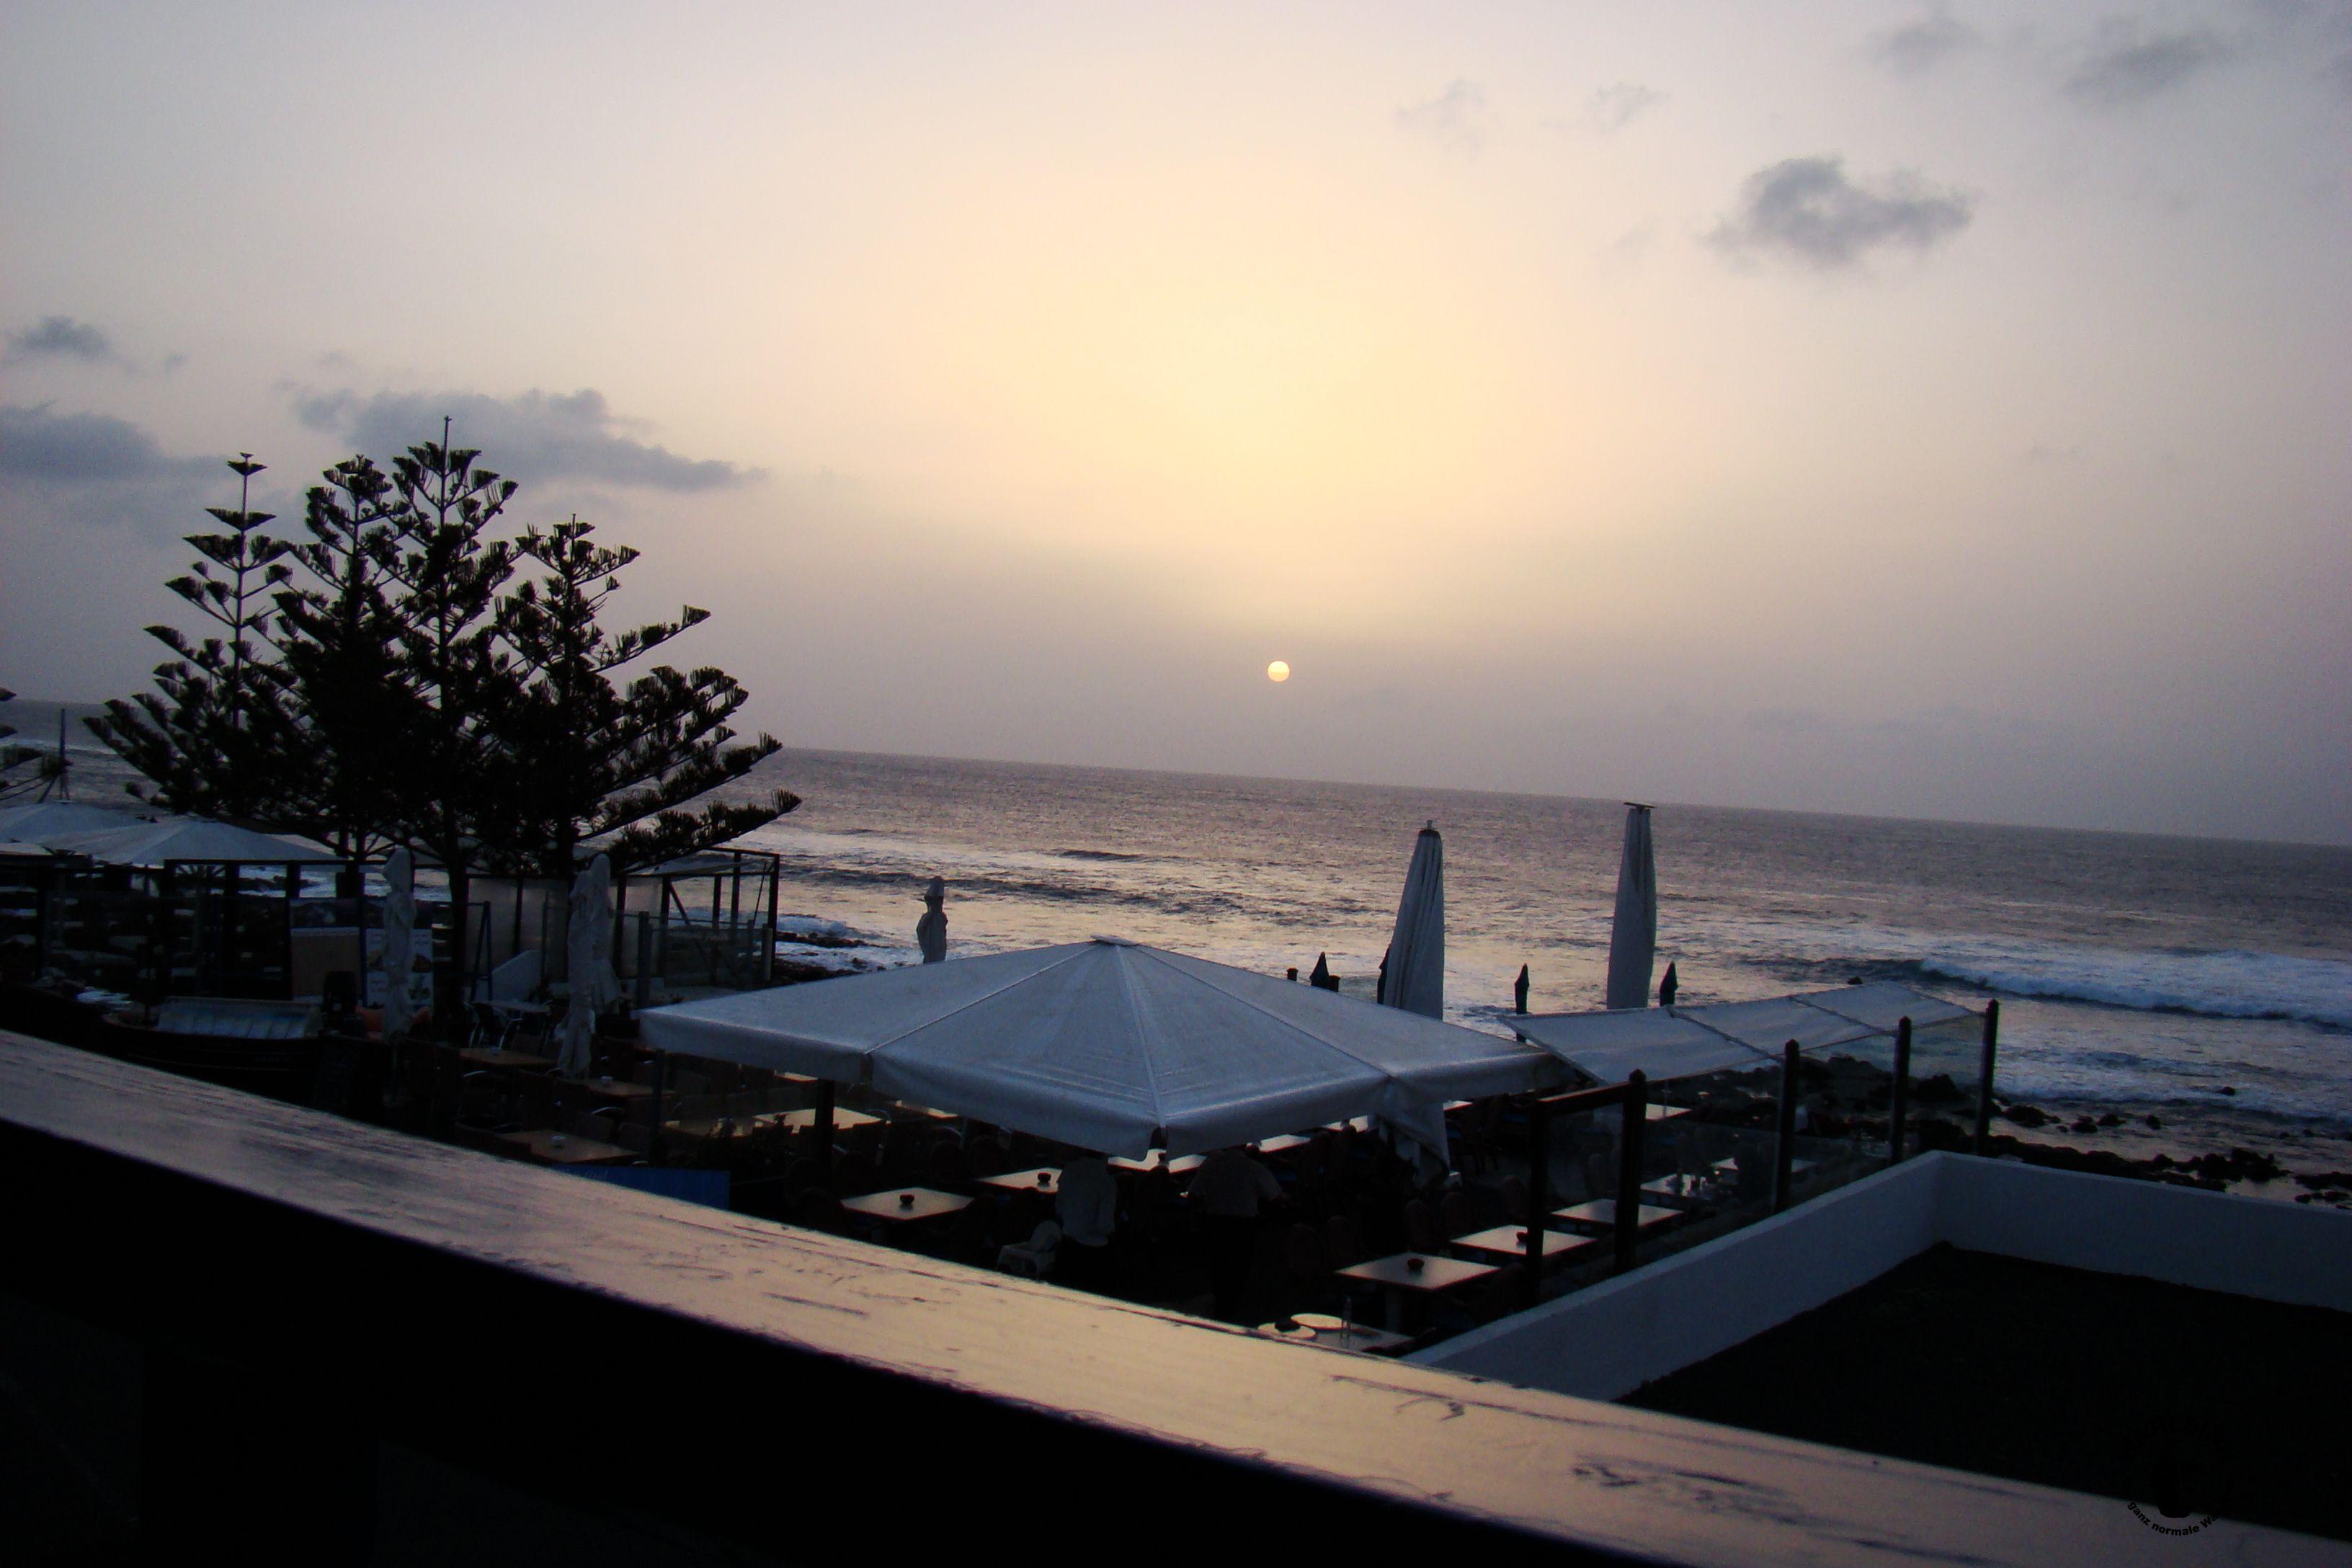 Lanzarote - Sonnenuntergang